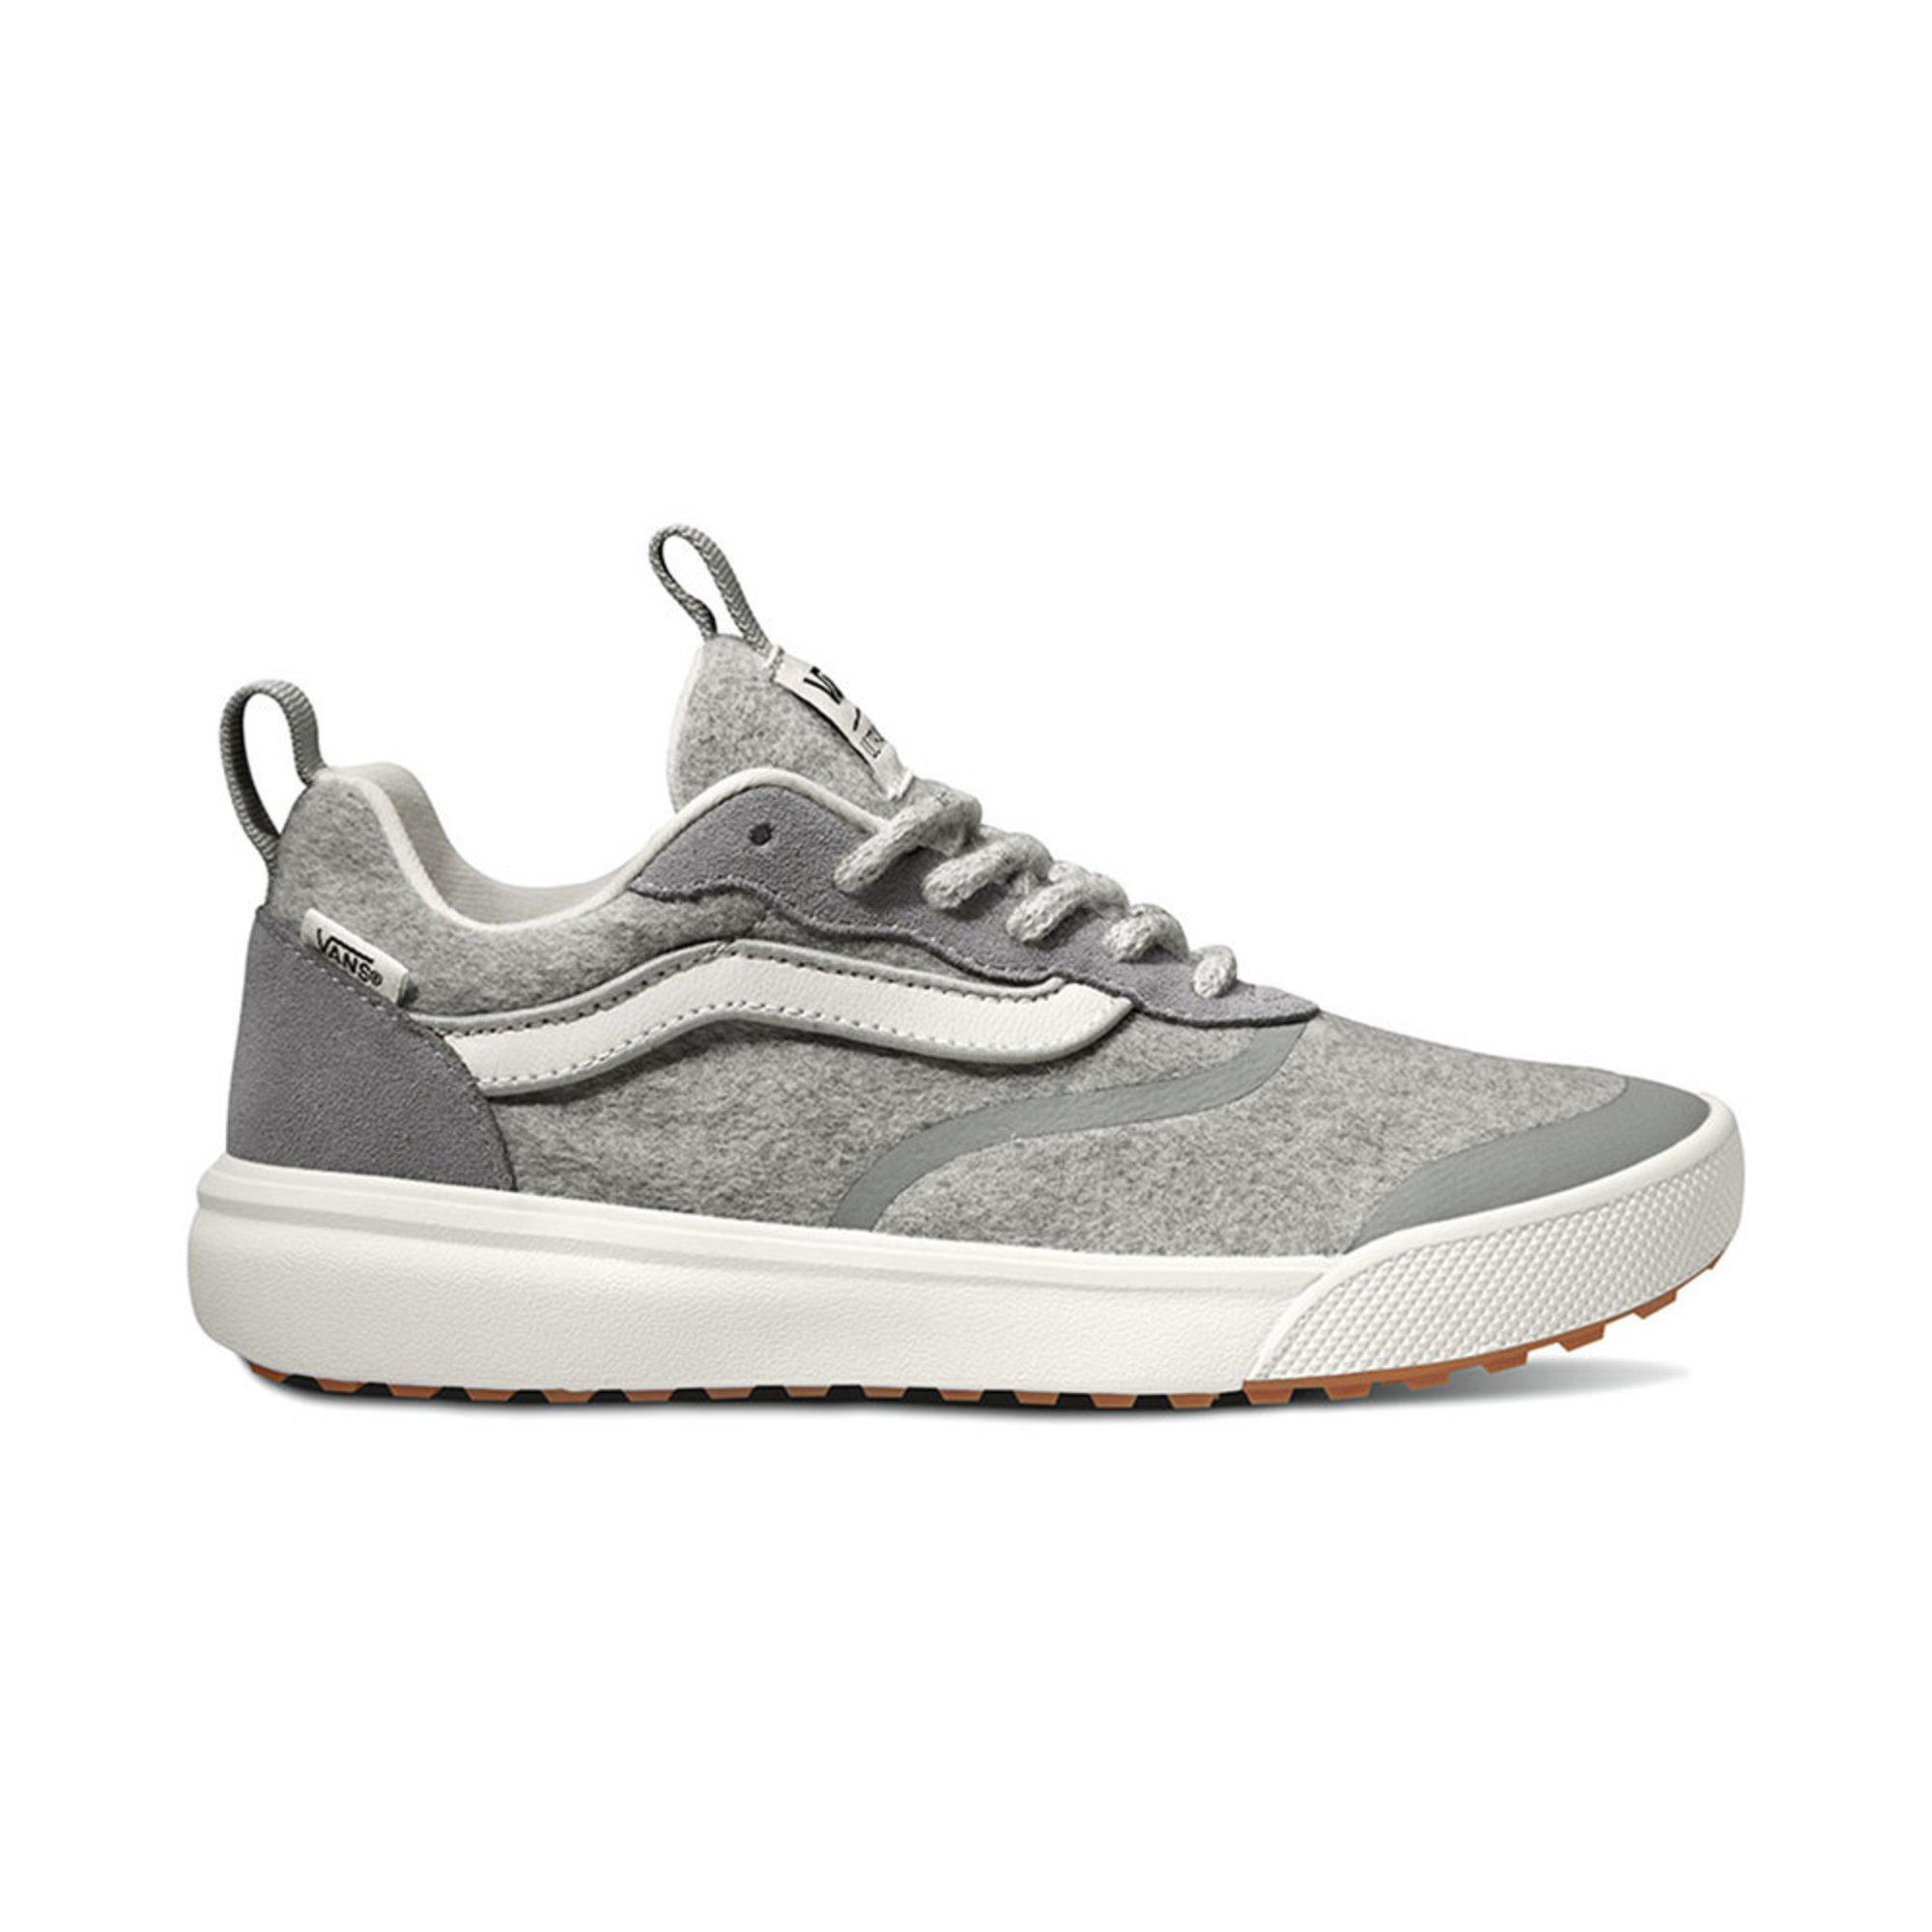 6a9377add226de Vans Unisex Ultrarange Rapidweld Lifestyle Shoe